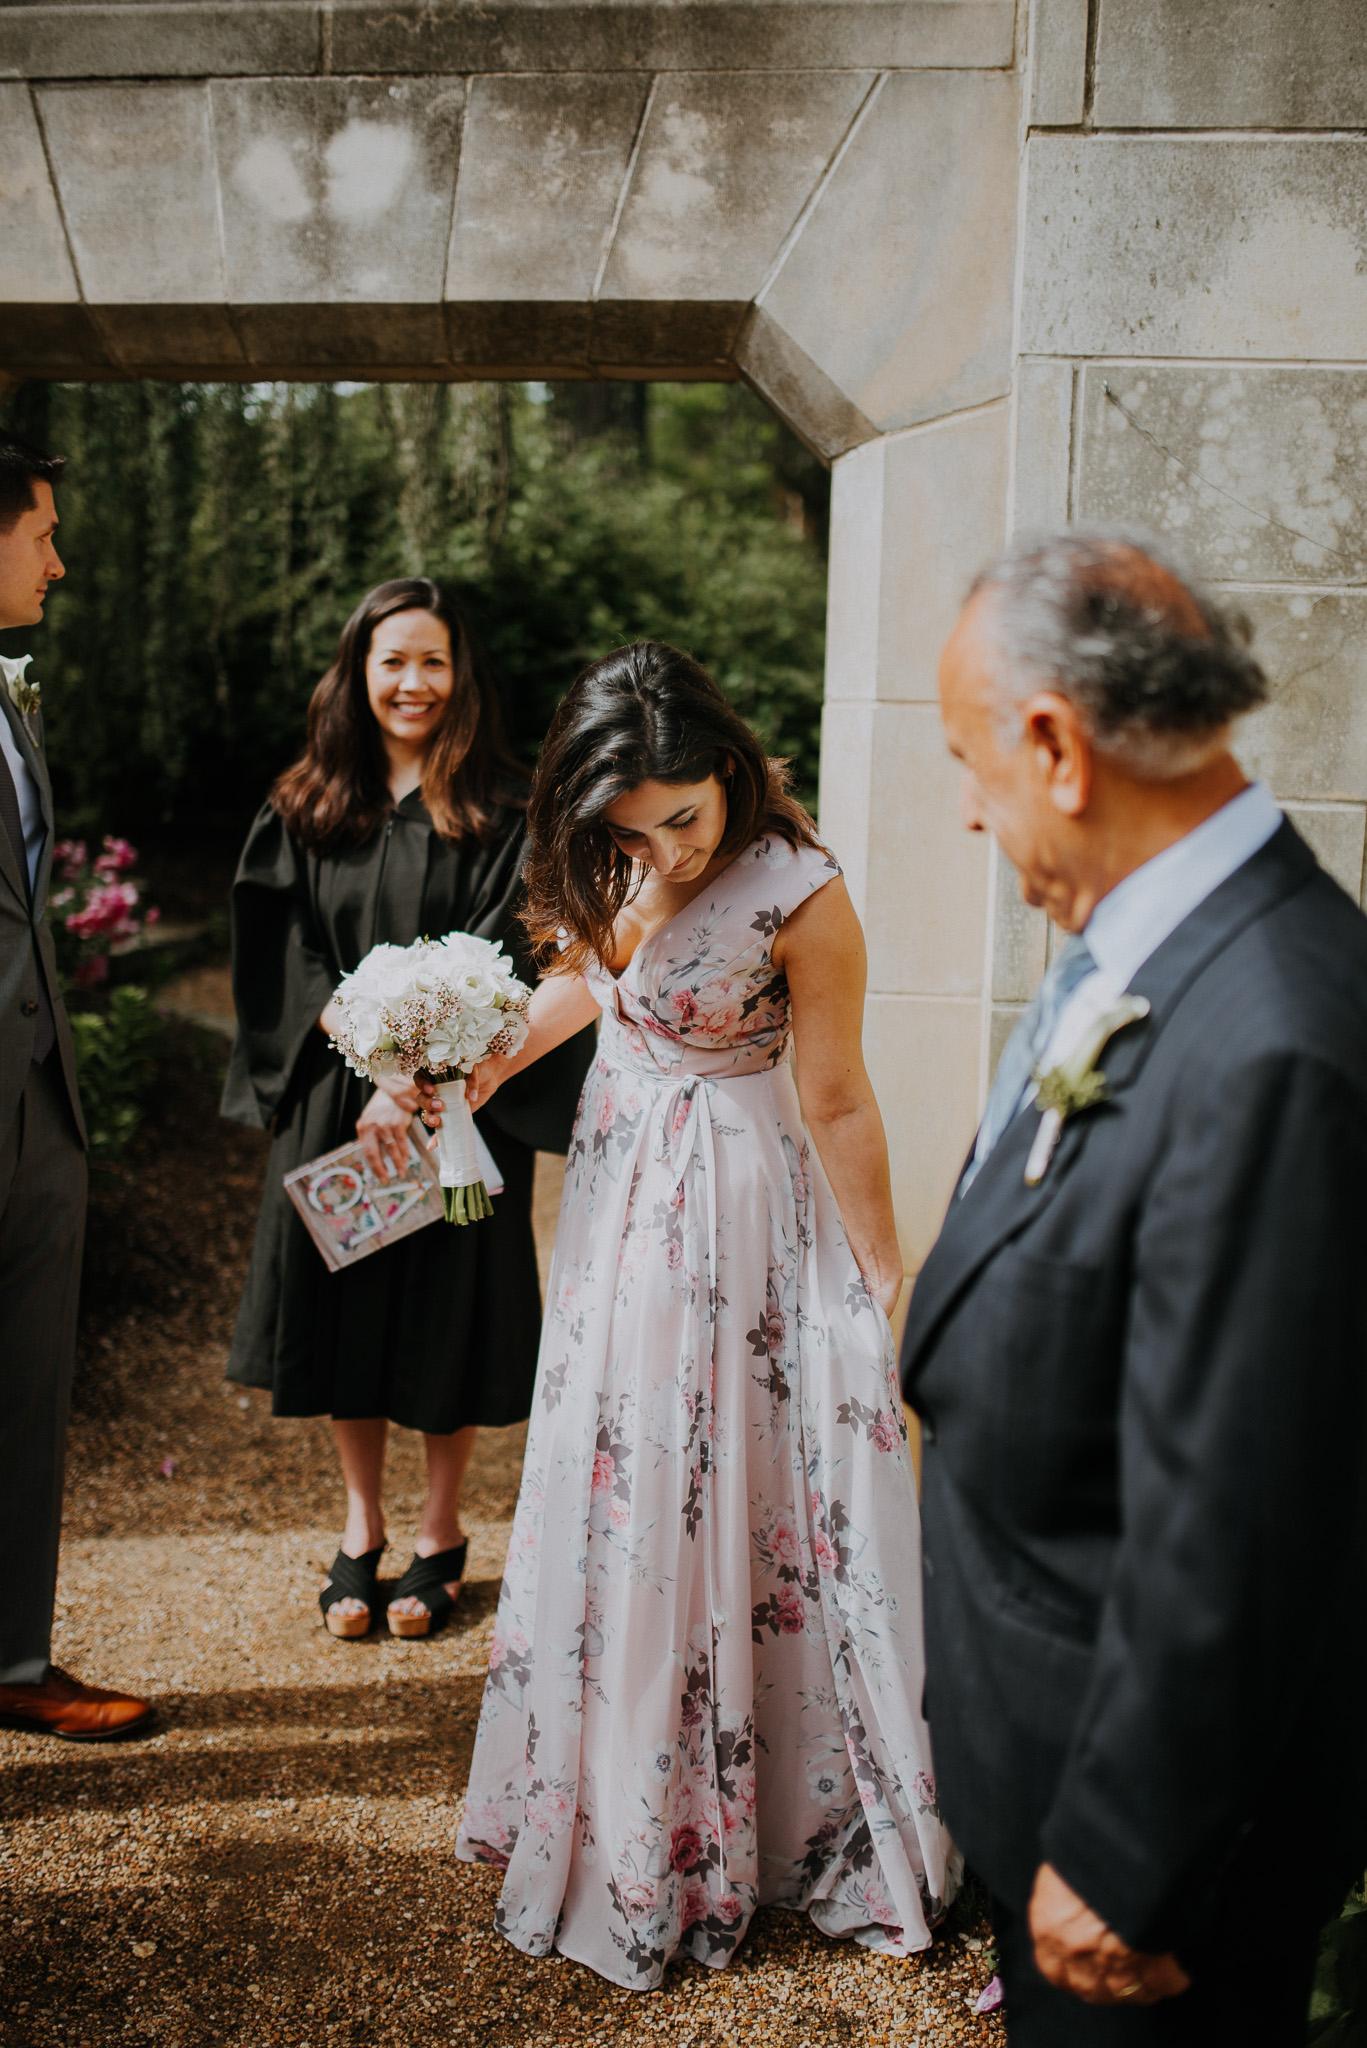 Dallas-fort-worth-wedding-photographer-dallas-arboretum-intimate-wedding-dallas-texas-14